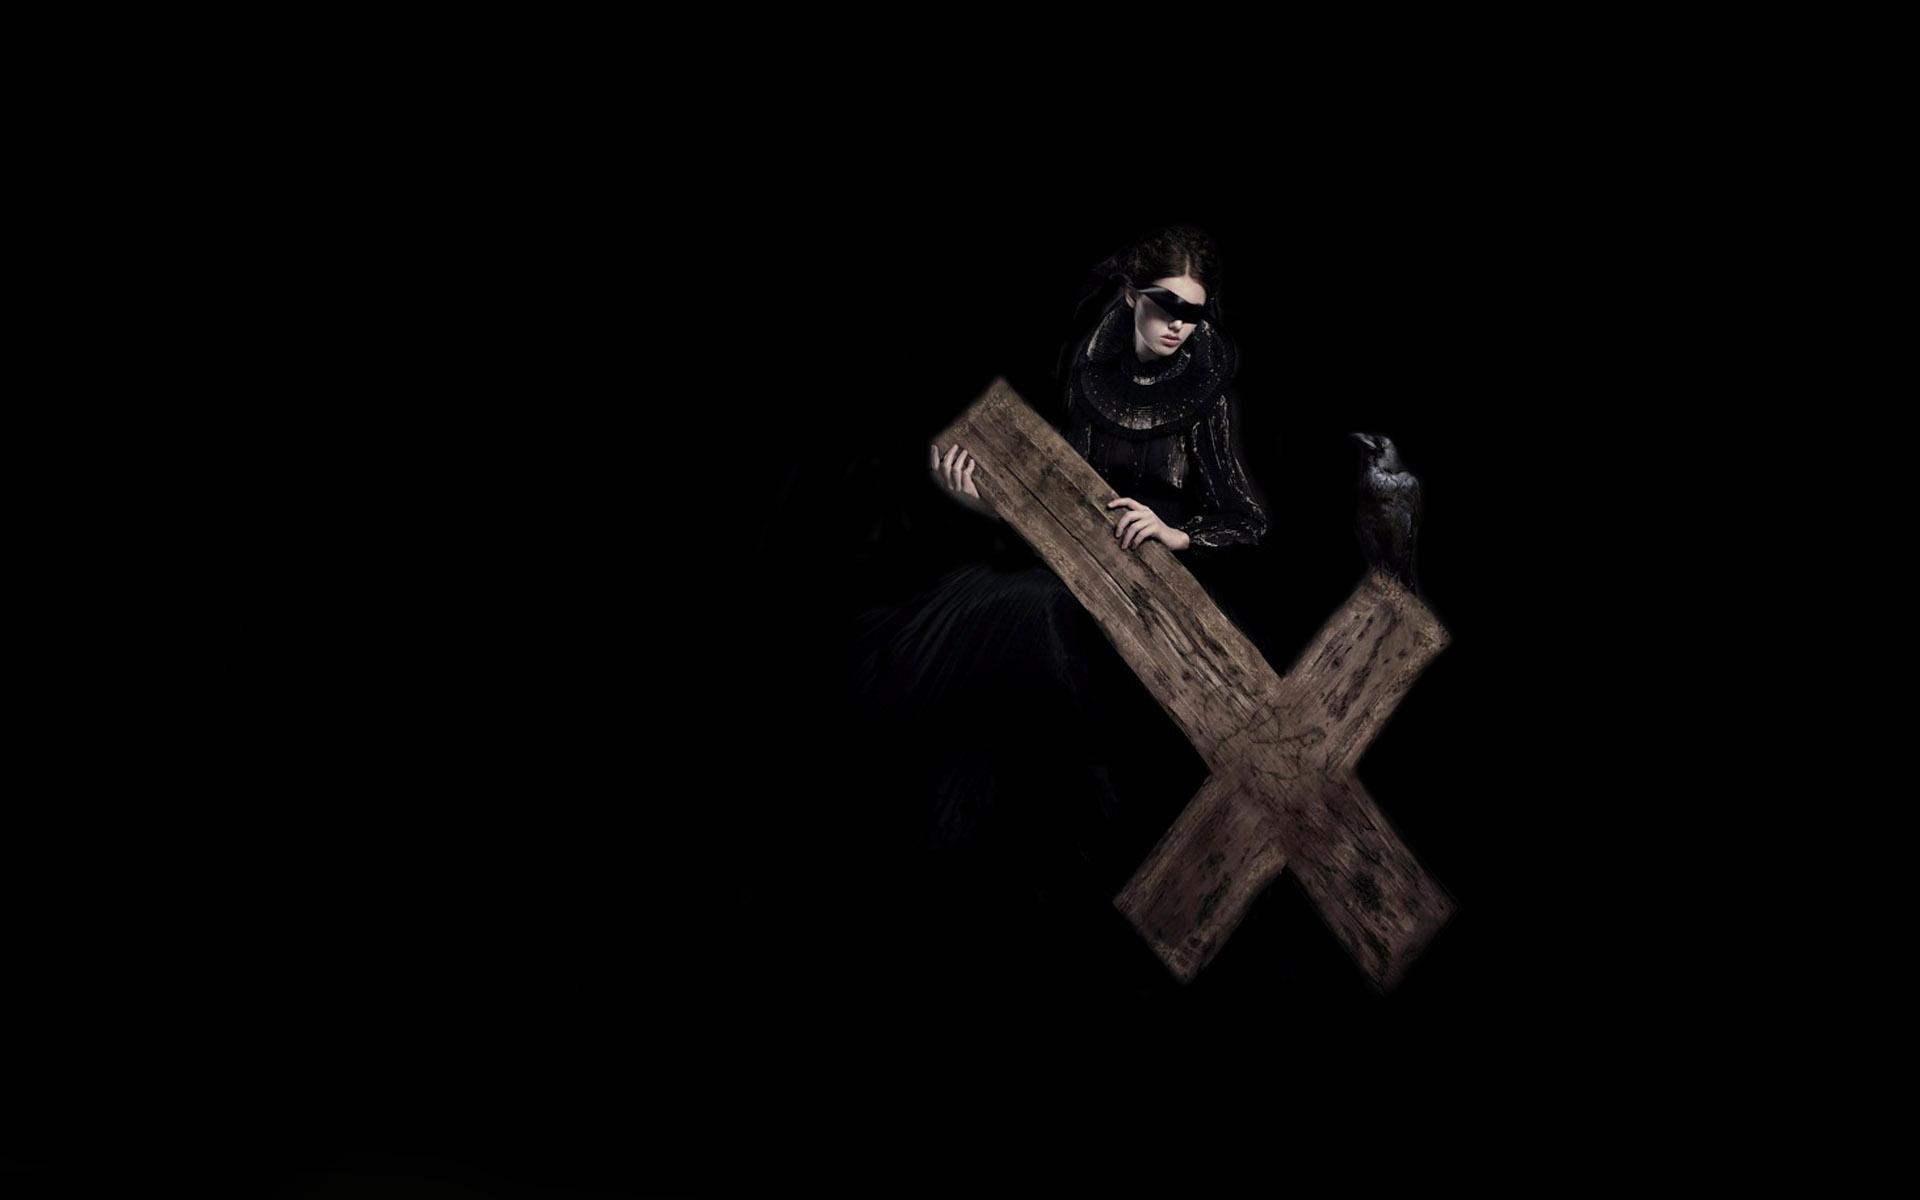 dark horror fantasy gothic cross evil woemn raven birds occult anti 1920x1200